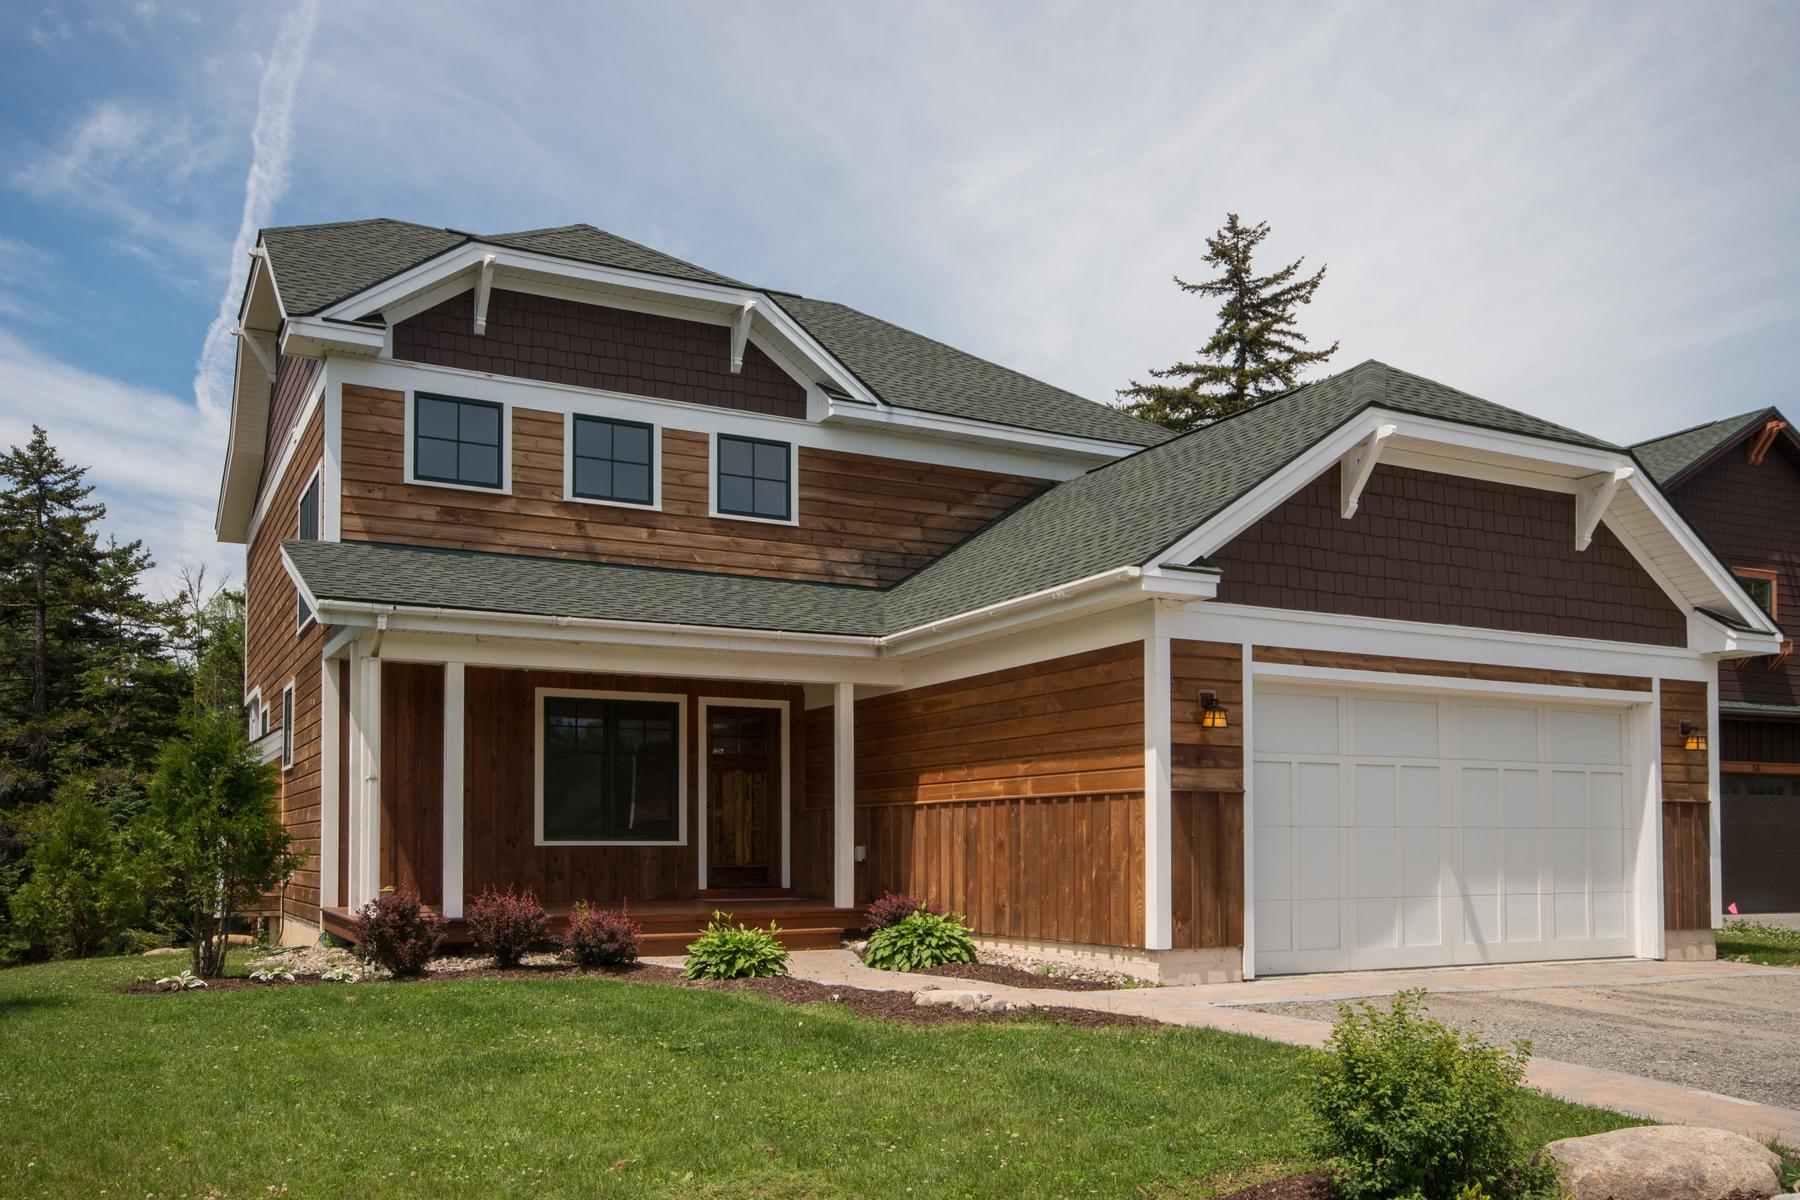 独户住宅 为 销售 在 Otter Lane 59 Otter Way Lane Lake Placid, 纽约州 12946 美国